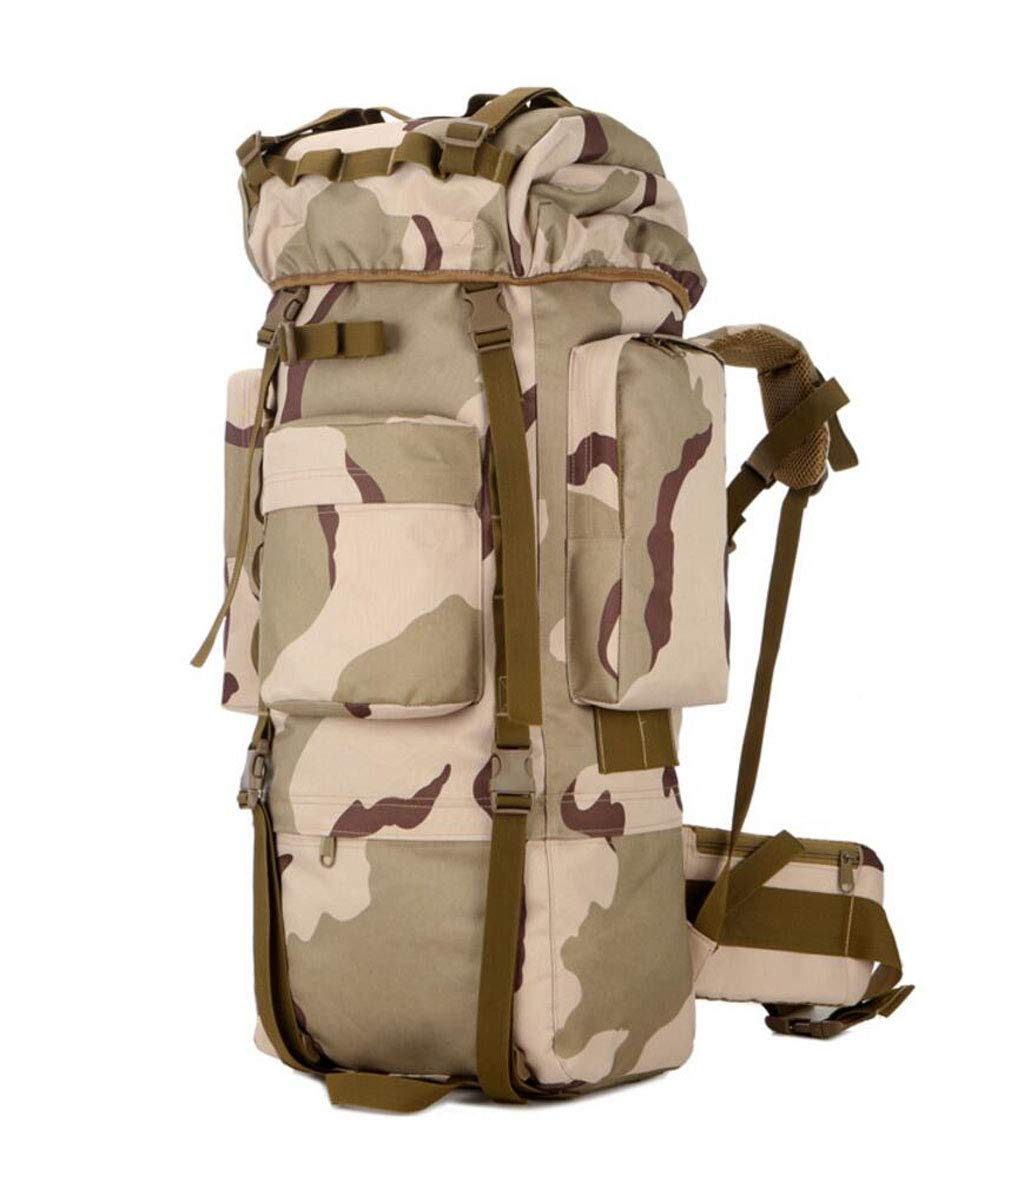 JSHFD カモフラージュ ハイキング アウトドア バックパック 大容量 メンズ レディース アウトドア ハイキング バッグ 装備バッグ 9色 B07GCPPHRH カラー4